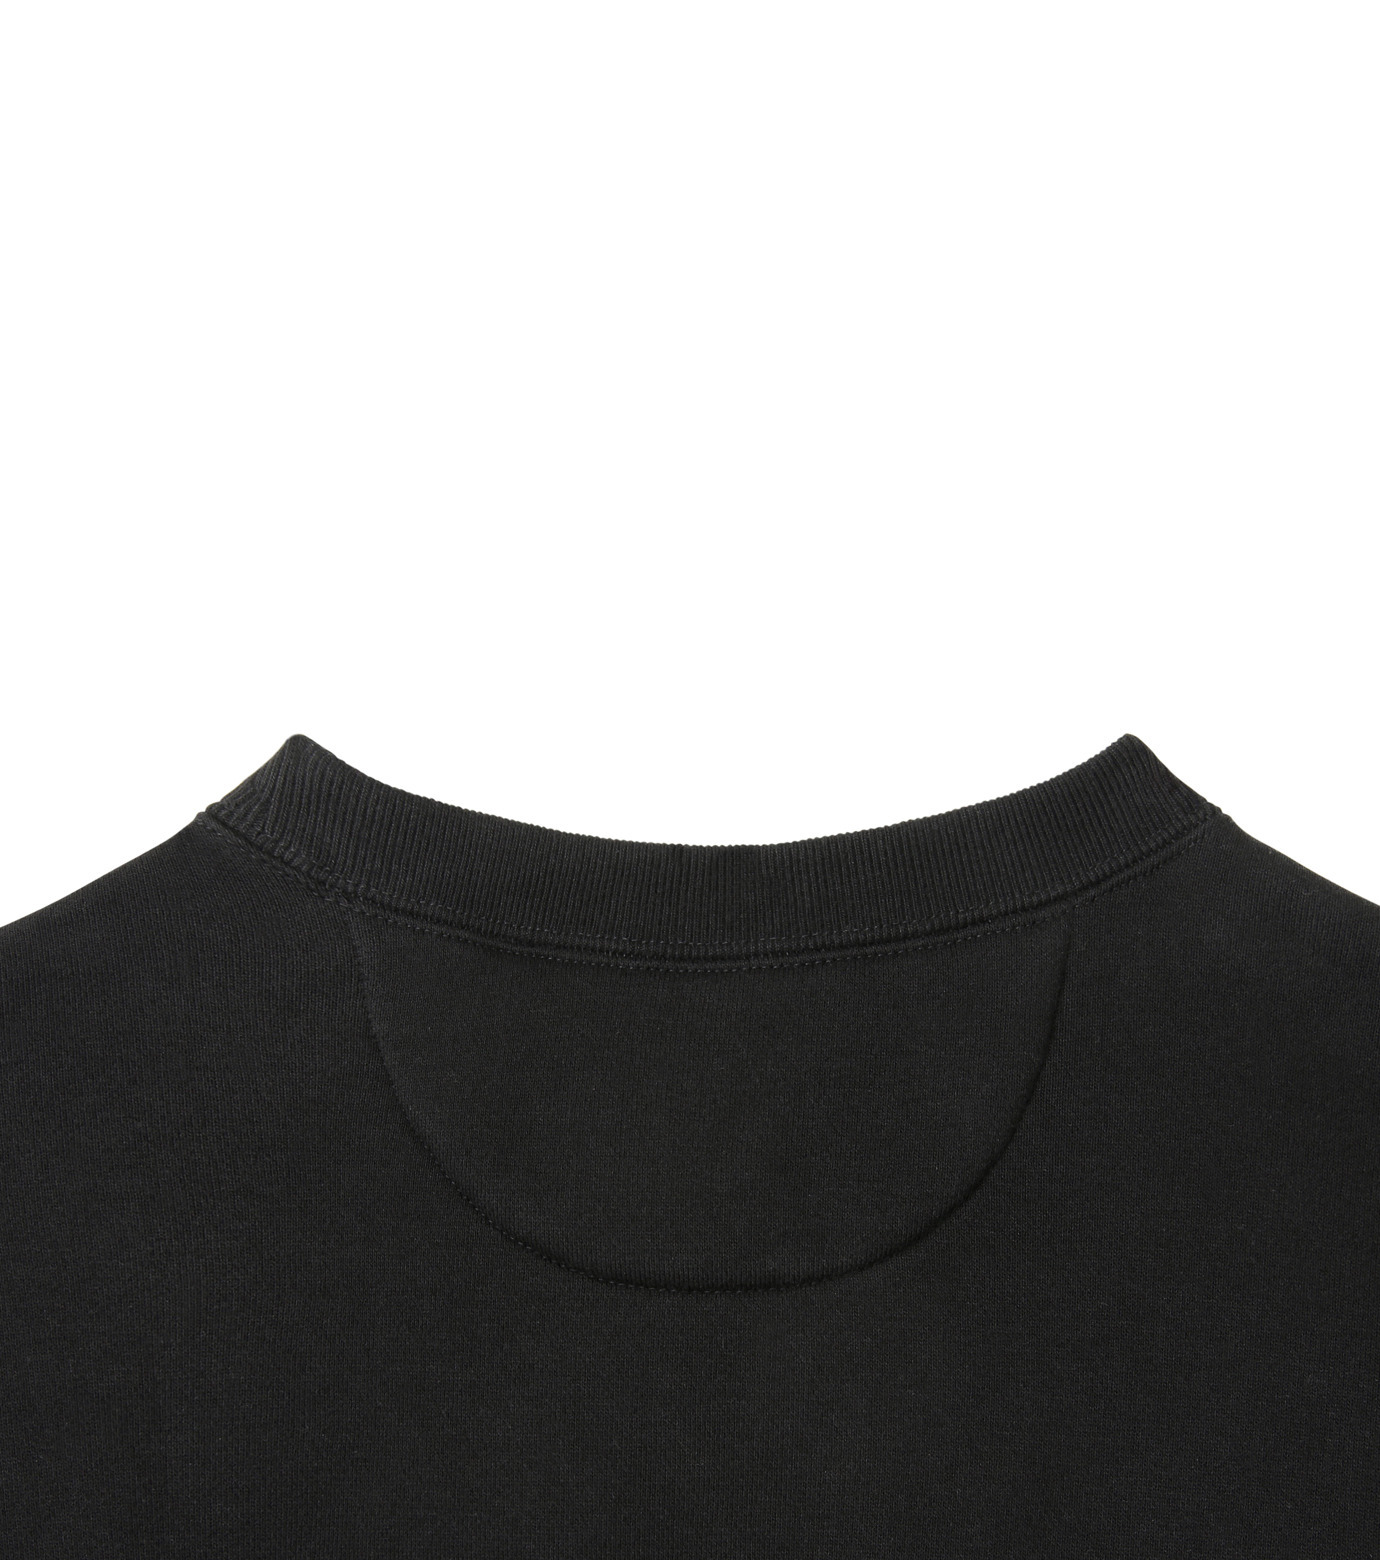 HL HEDDIE LOVU(エイチエル・エディールーヴ)のTHINGS pt SWEATS-BLACK(カットソー/cut and sewn)-18S92005-13 拡大詳細画像6